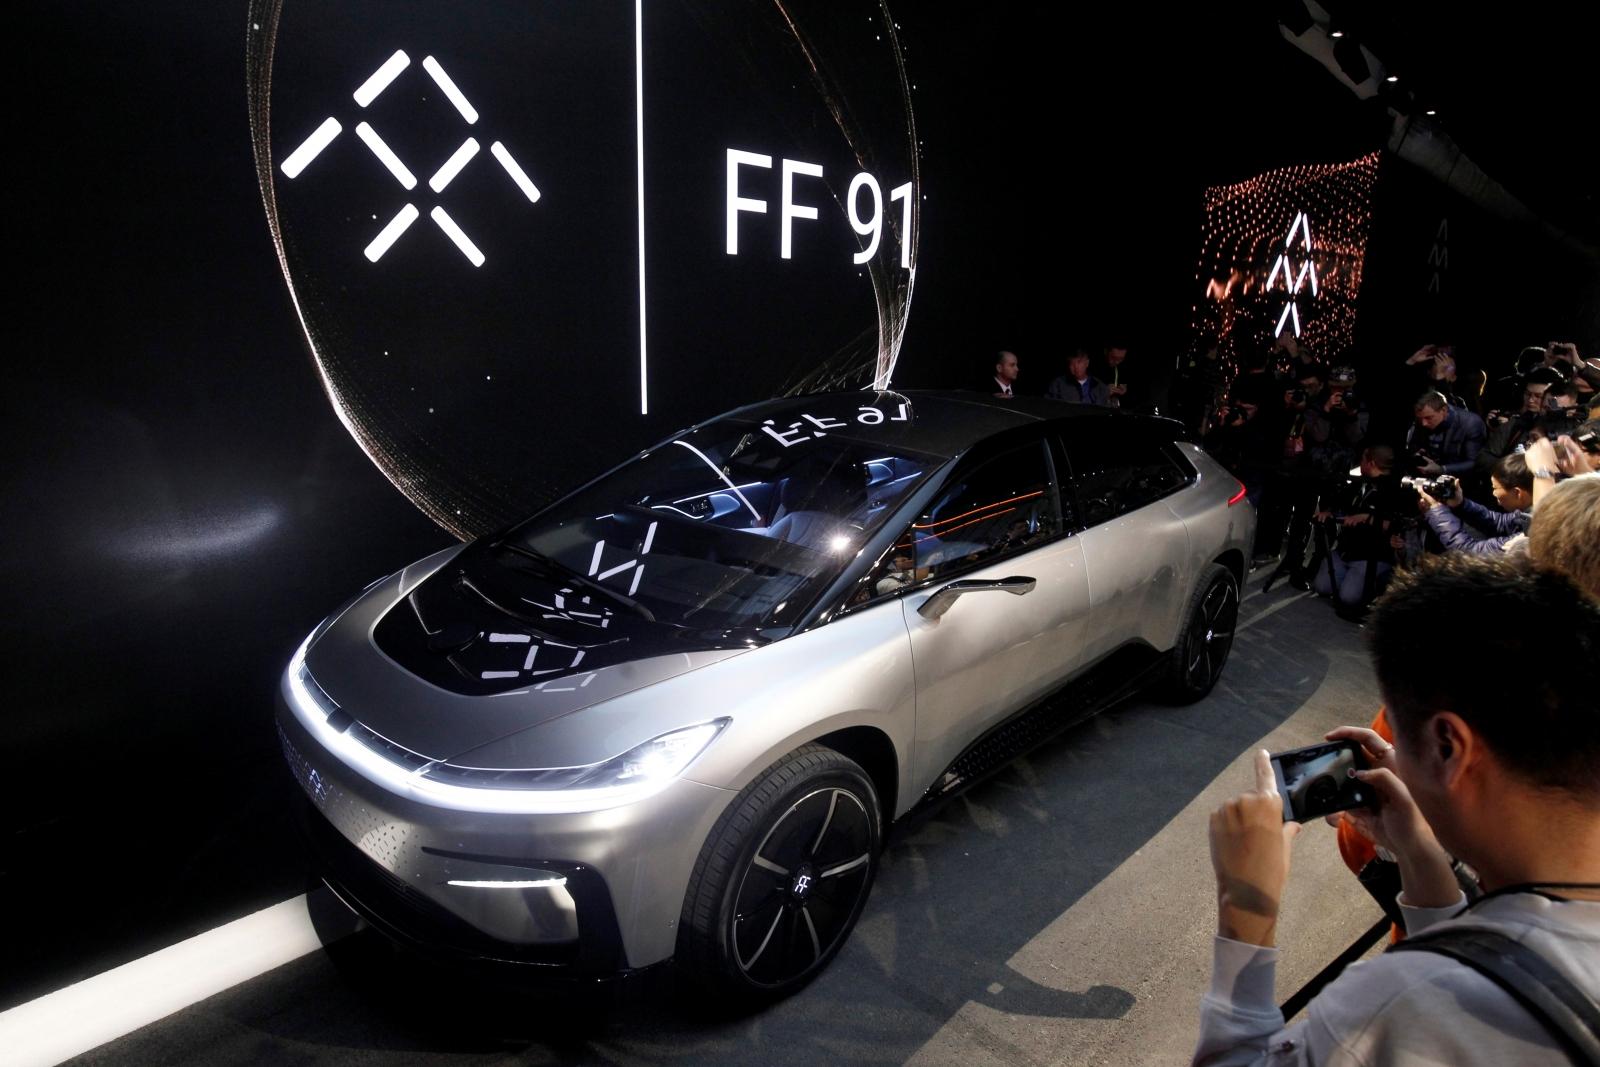 Faraday Future FF91 electric car